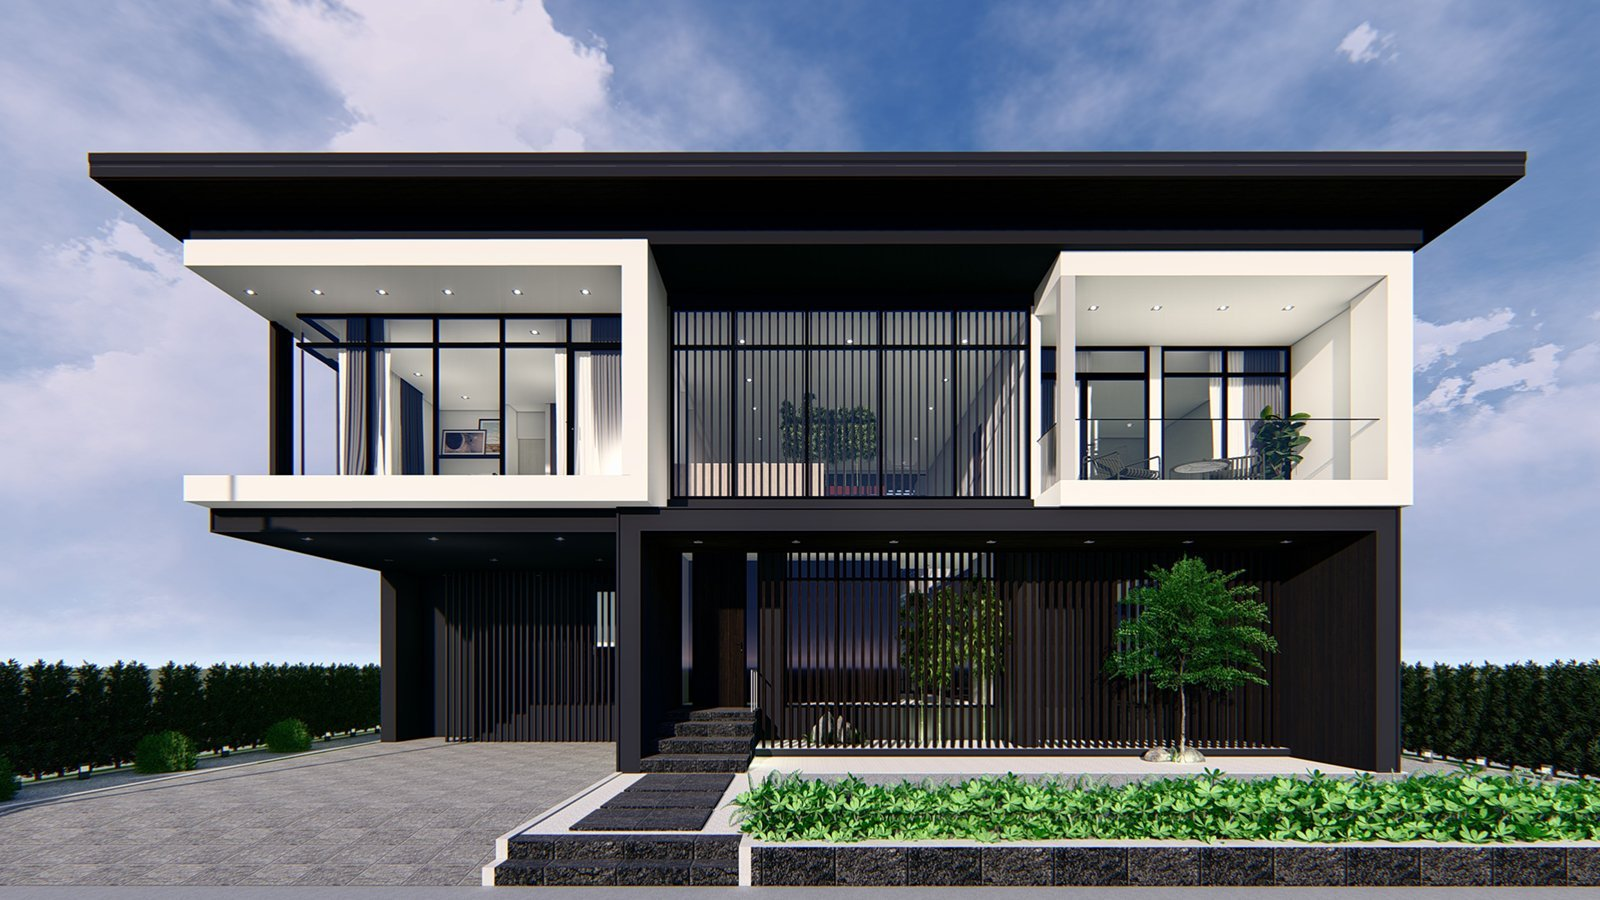 Module construction housing